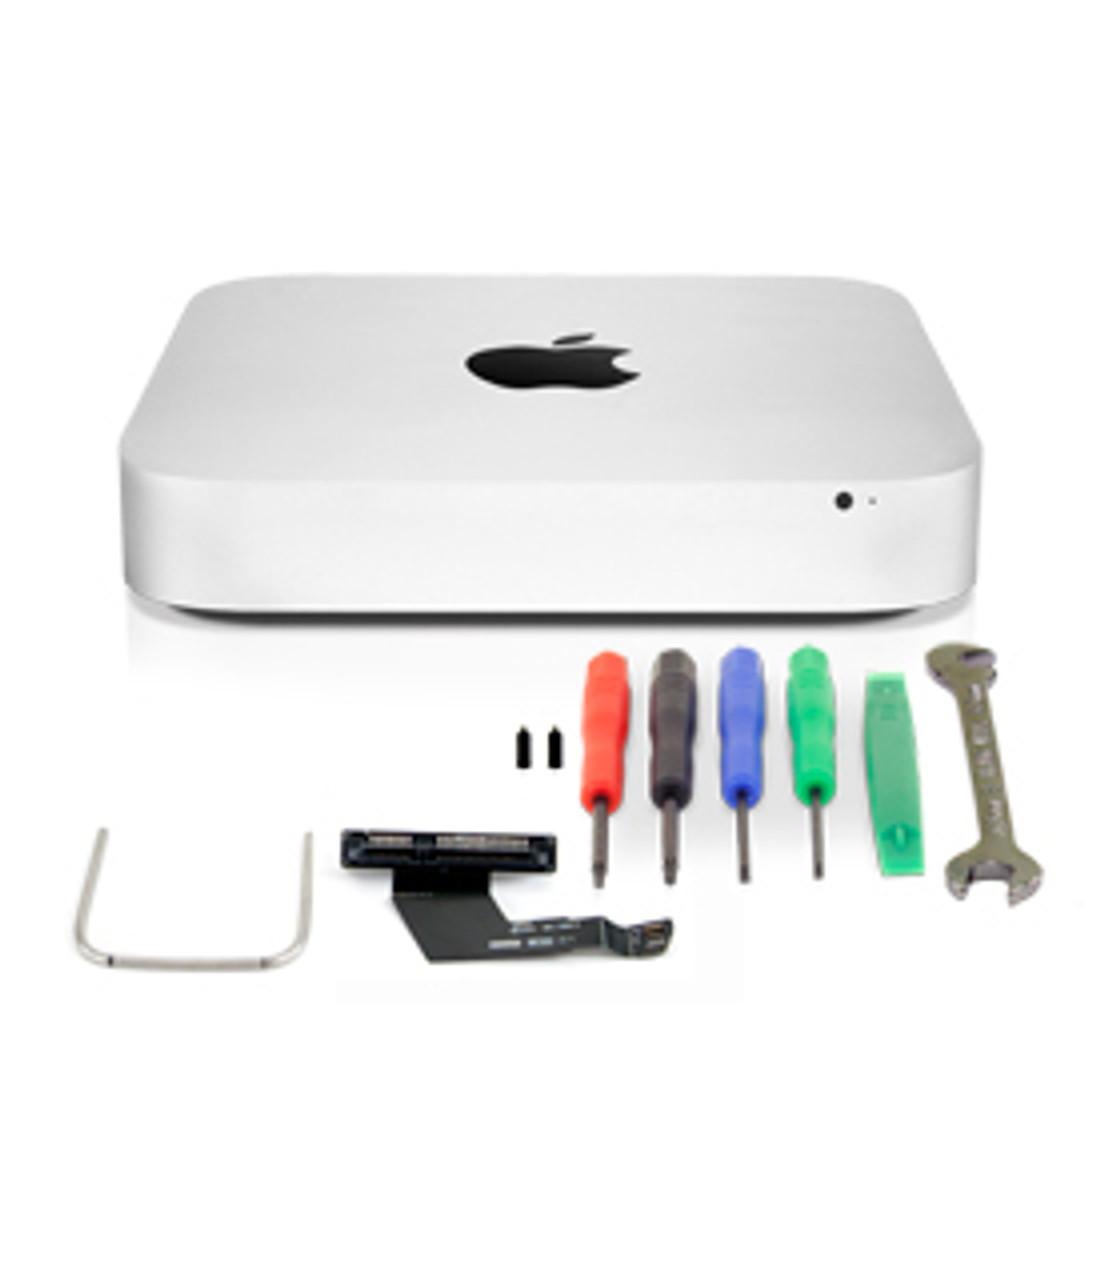 "OWC 'Data Doubler' SSD/2.5"" Hard Drive installation Kit for Mac mini 2011, 2012"